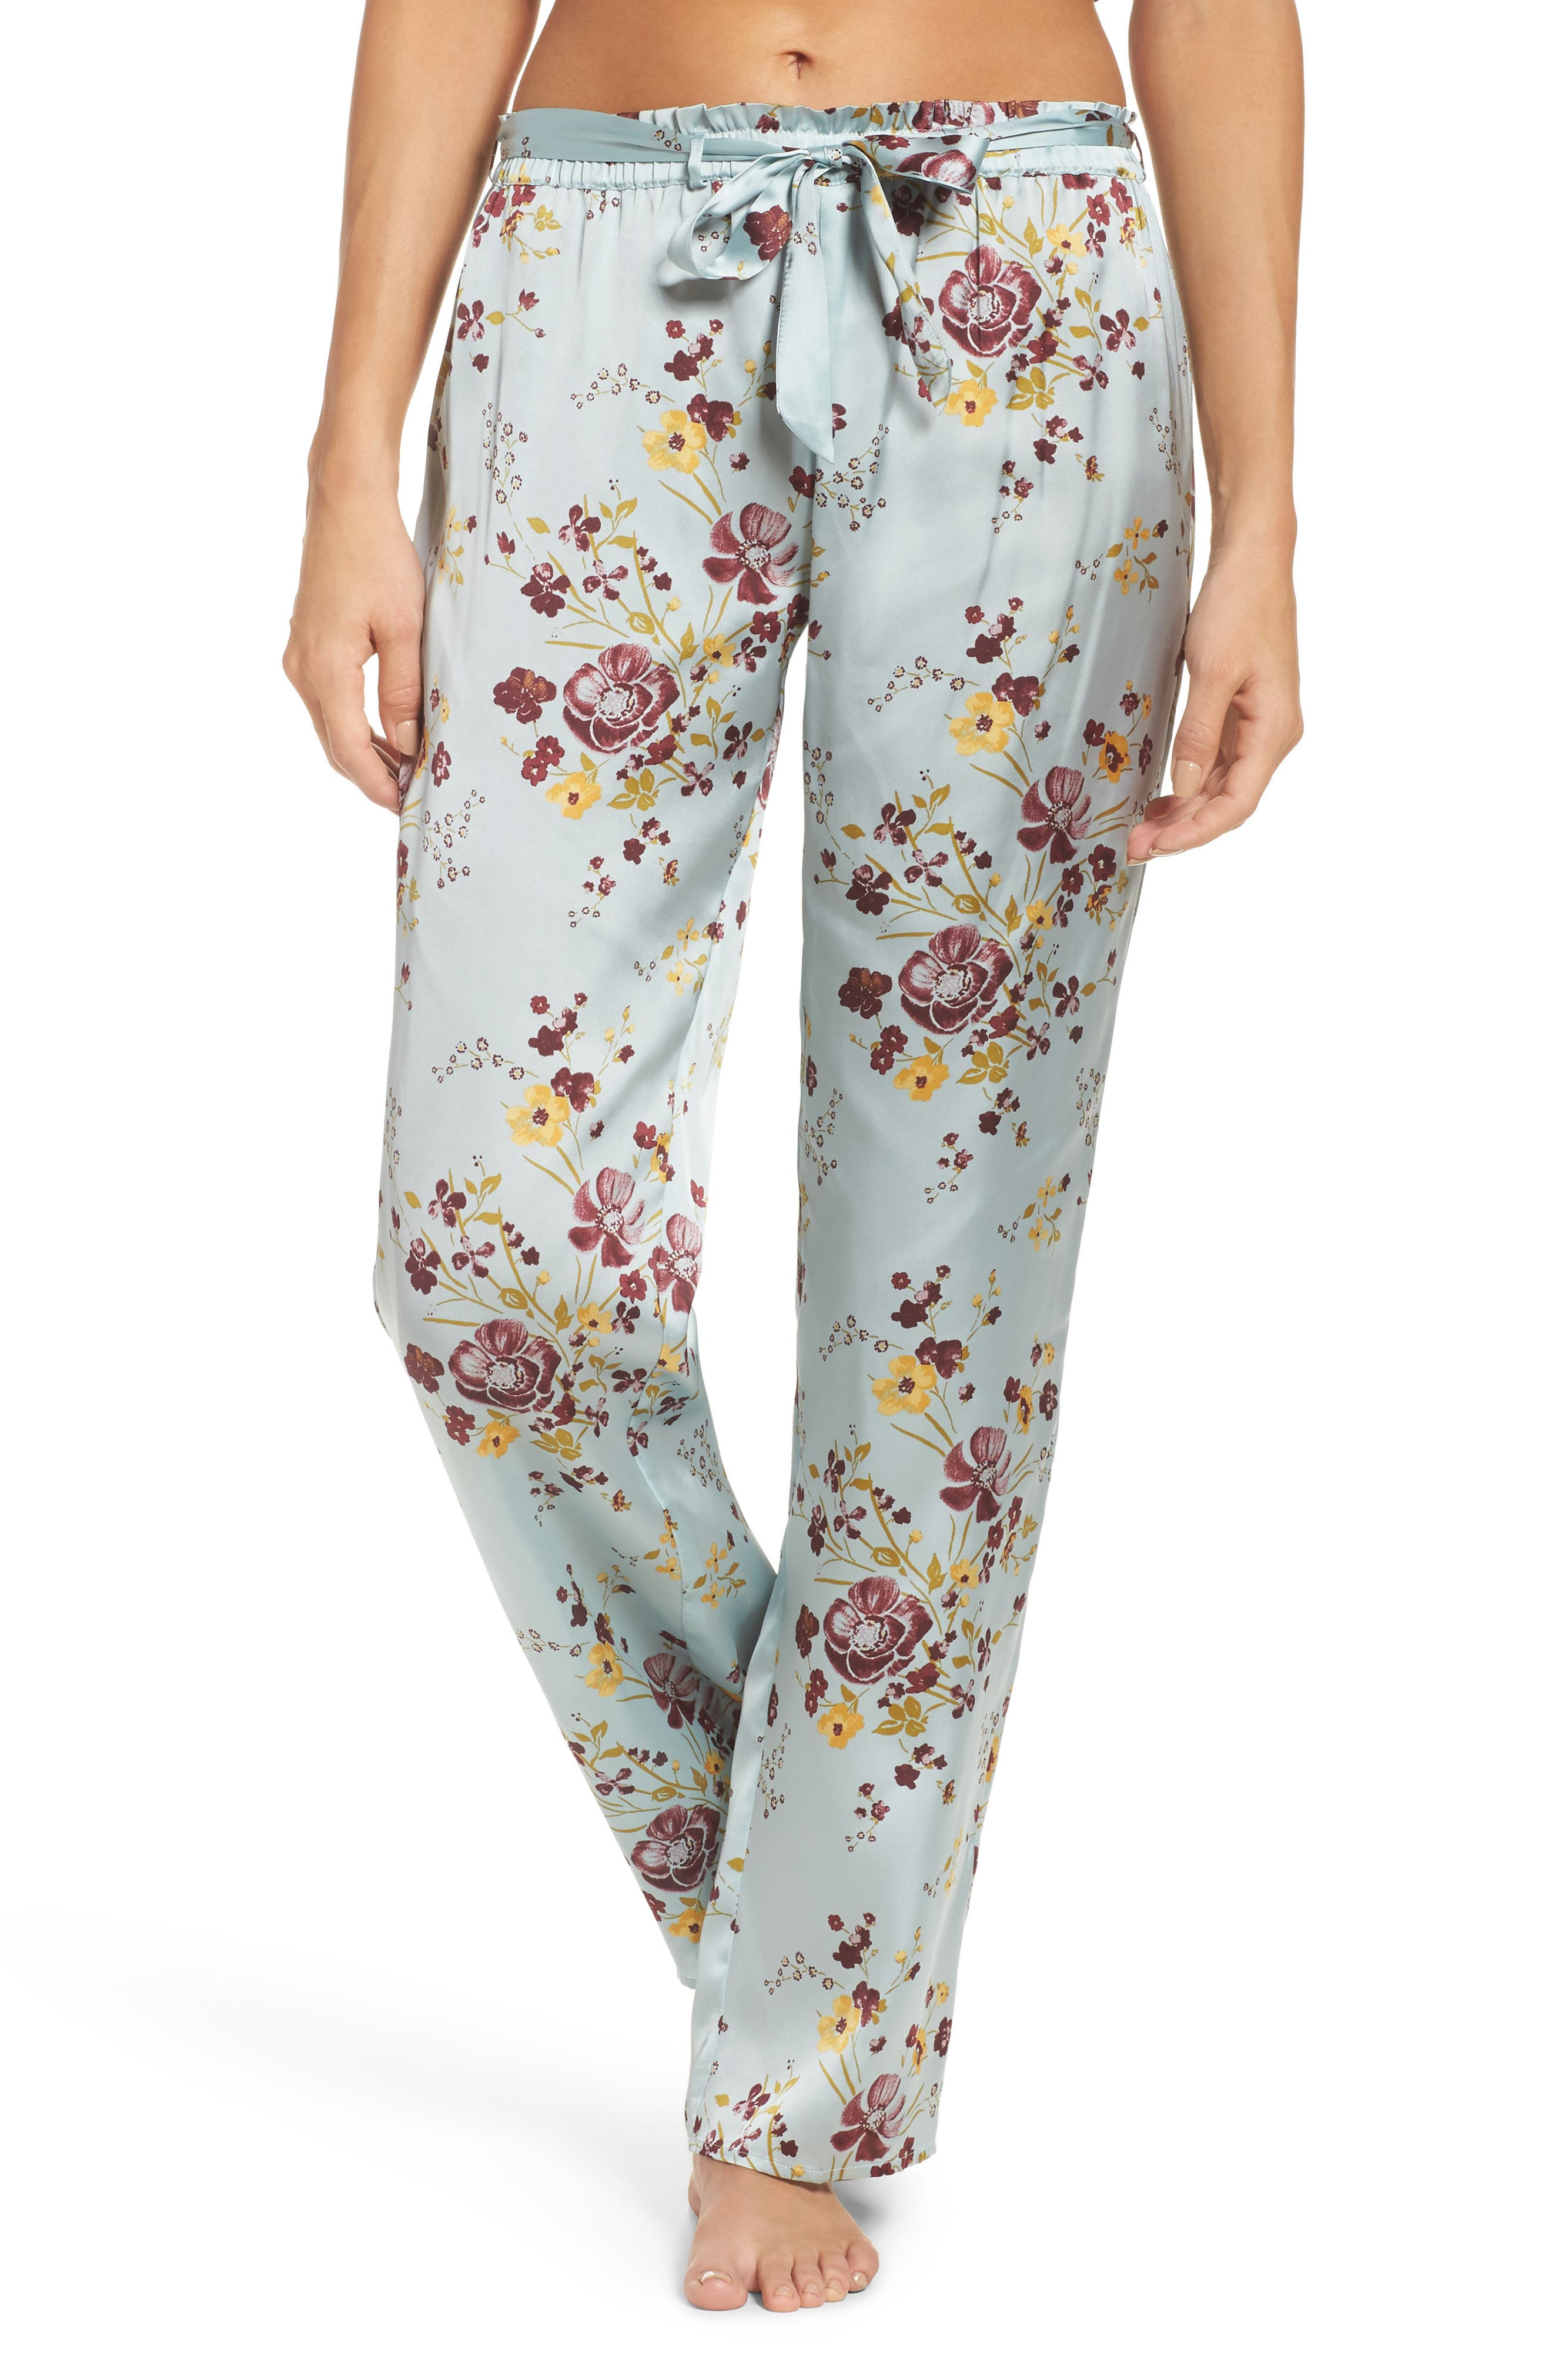 In My Dreams Pajama Pants,                             Main thumbnail 1, color,                             Blue Cloud Pretty Floral